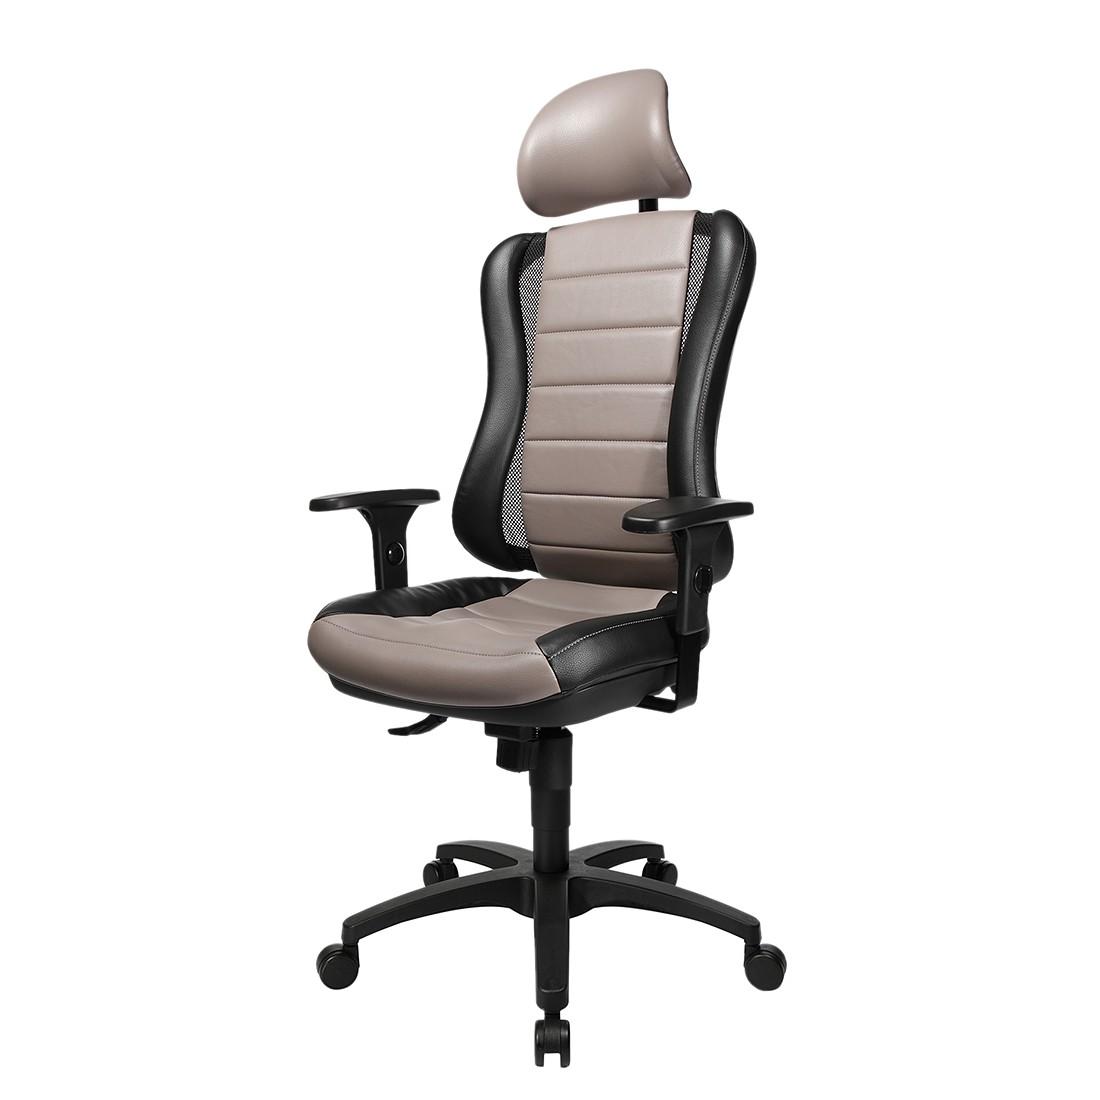 Bürodrehstuhl Head Point RS – Schwarz/Grau, Topstar günstig